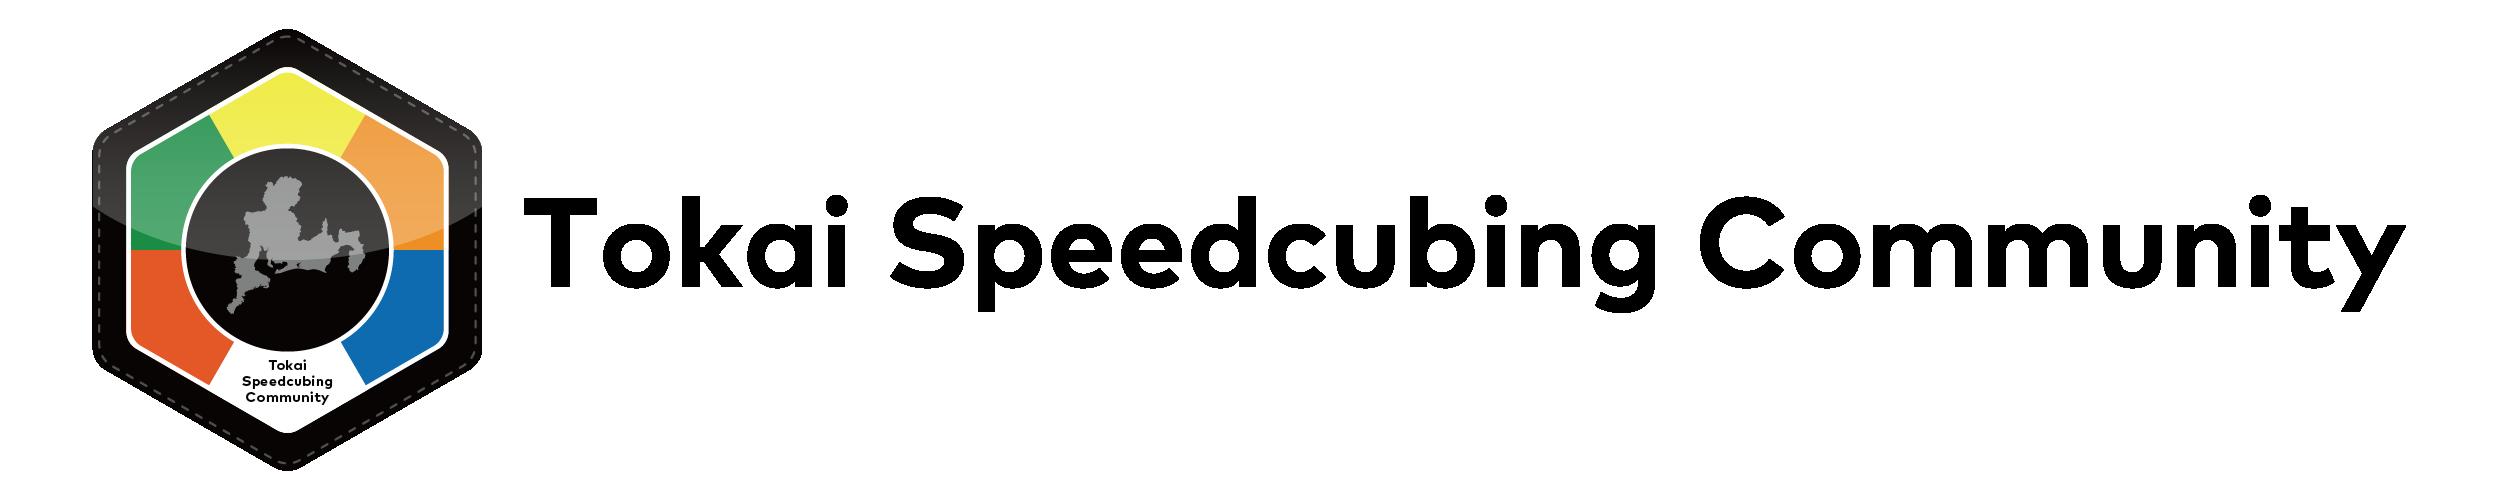 Tokai Speedcubing Community